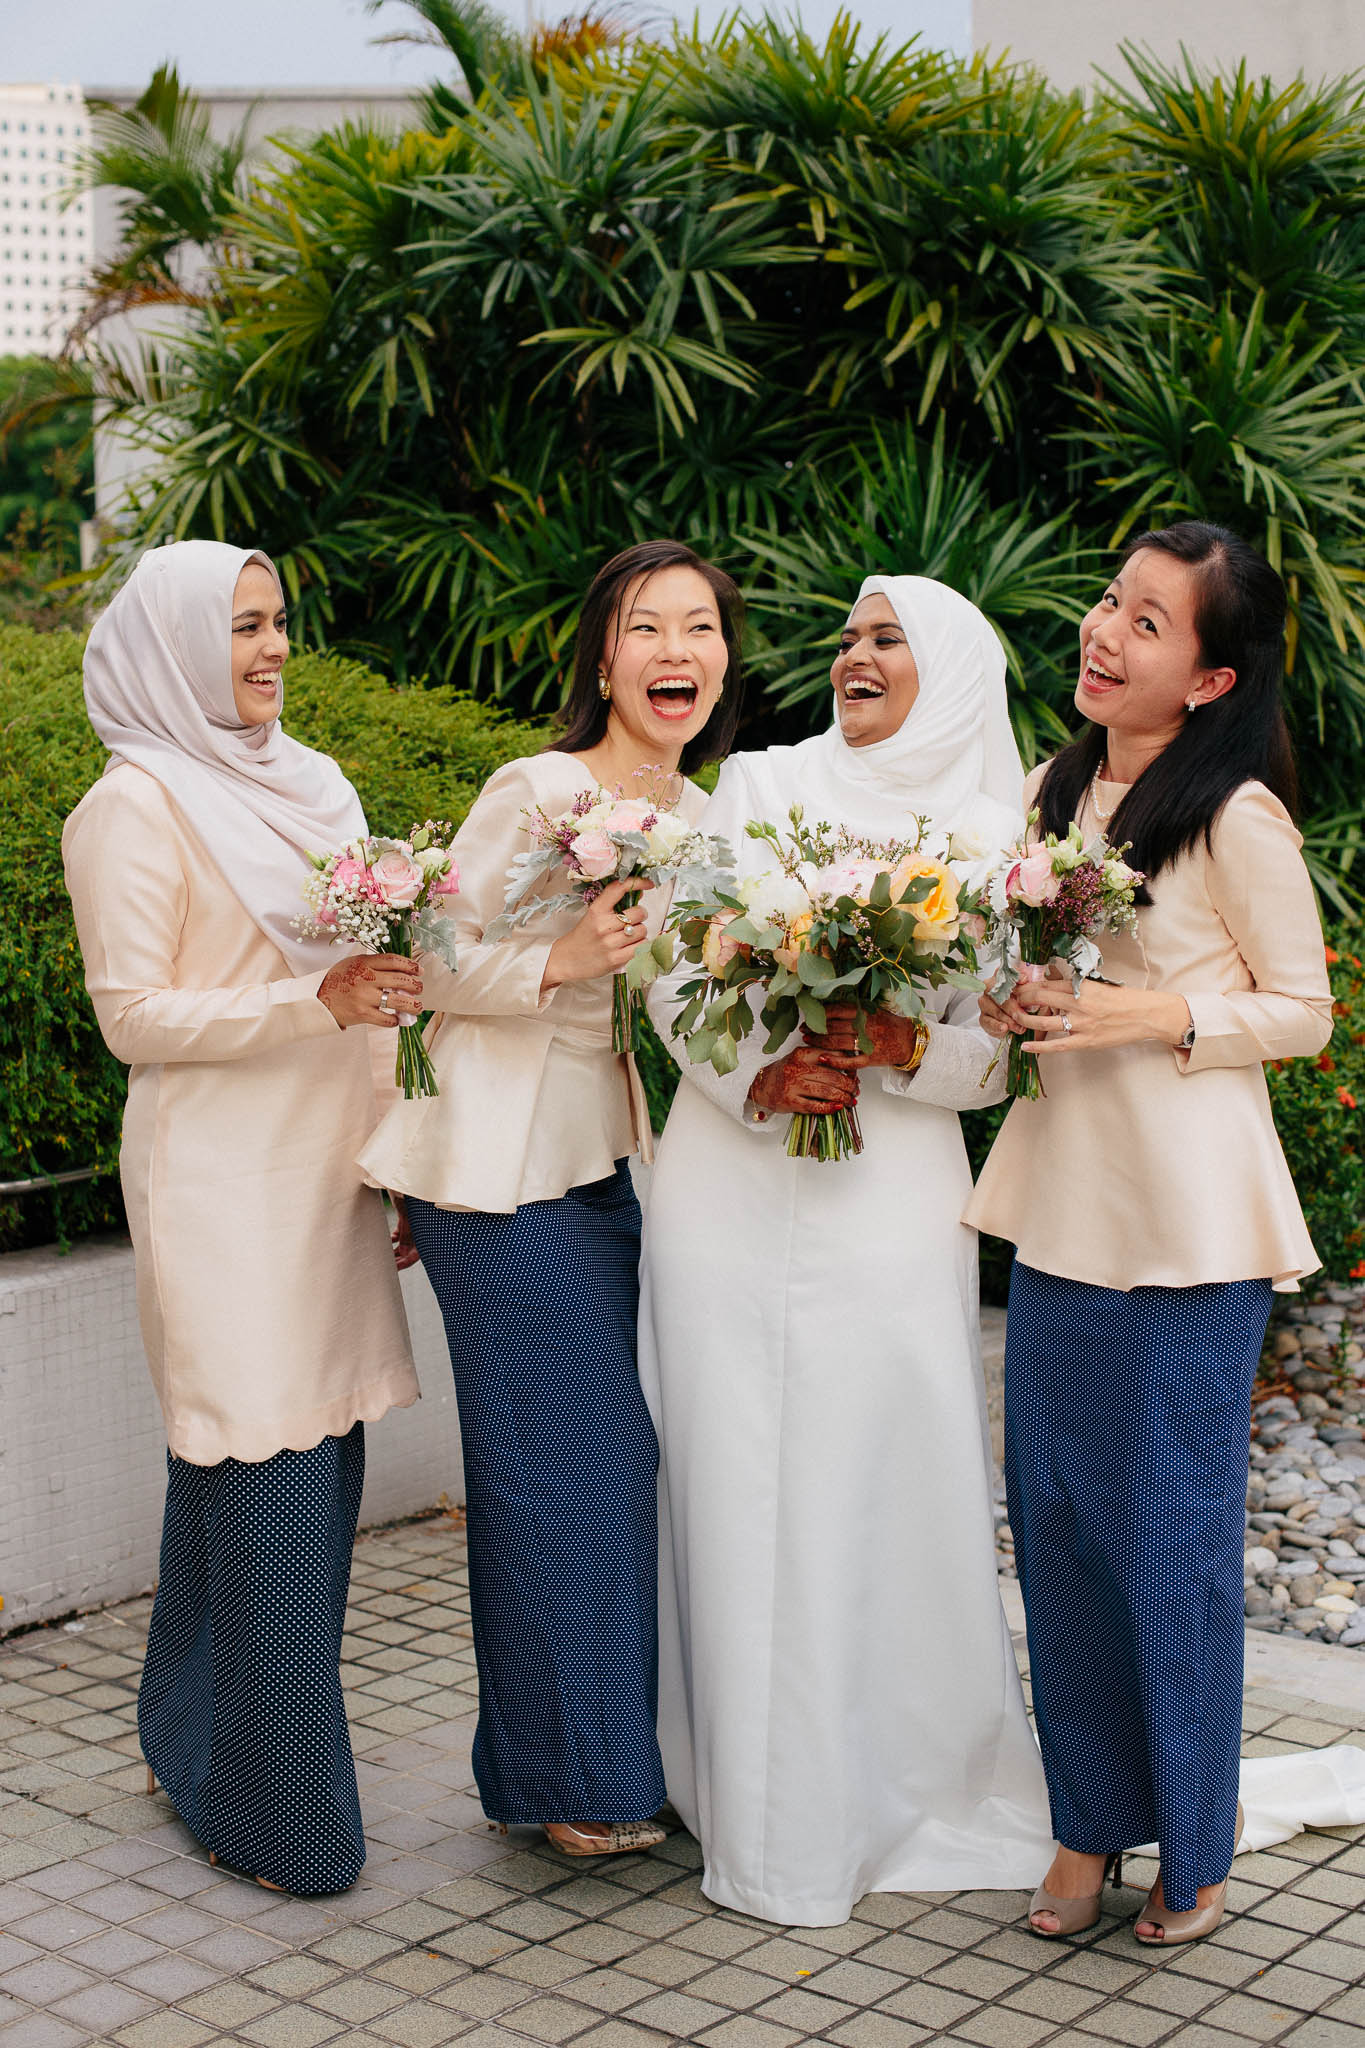 singapore-wedding-photographer-malay-indian-pre-wedding-travel-wmt-2015-shereen-farid-46.jpg